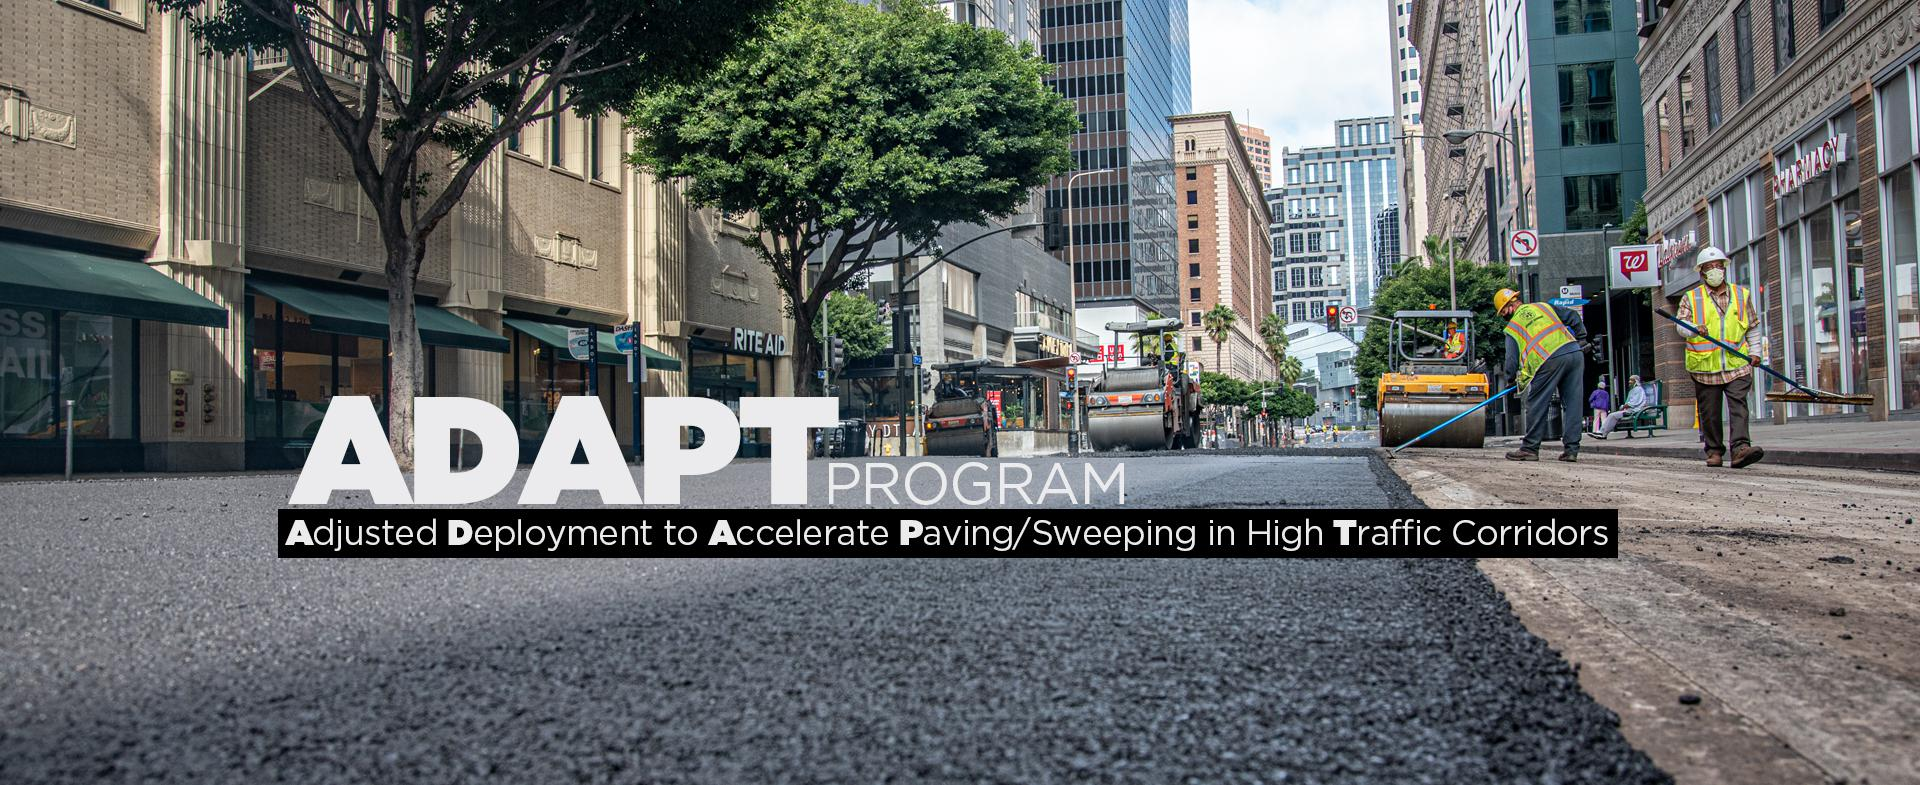 ADAPT Program